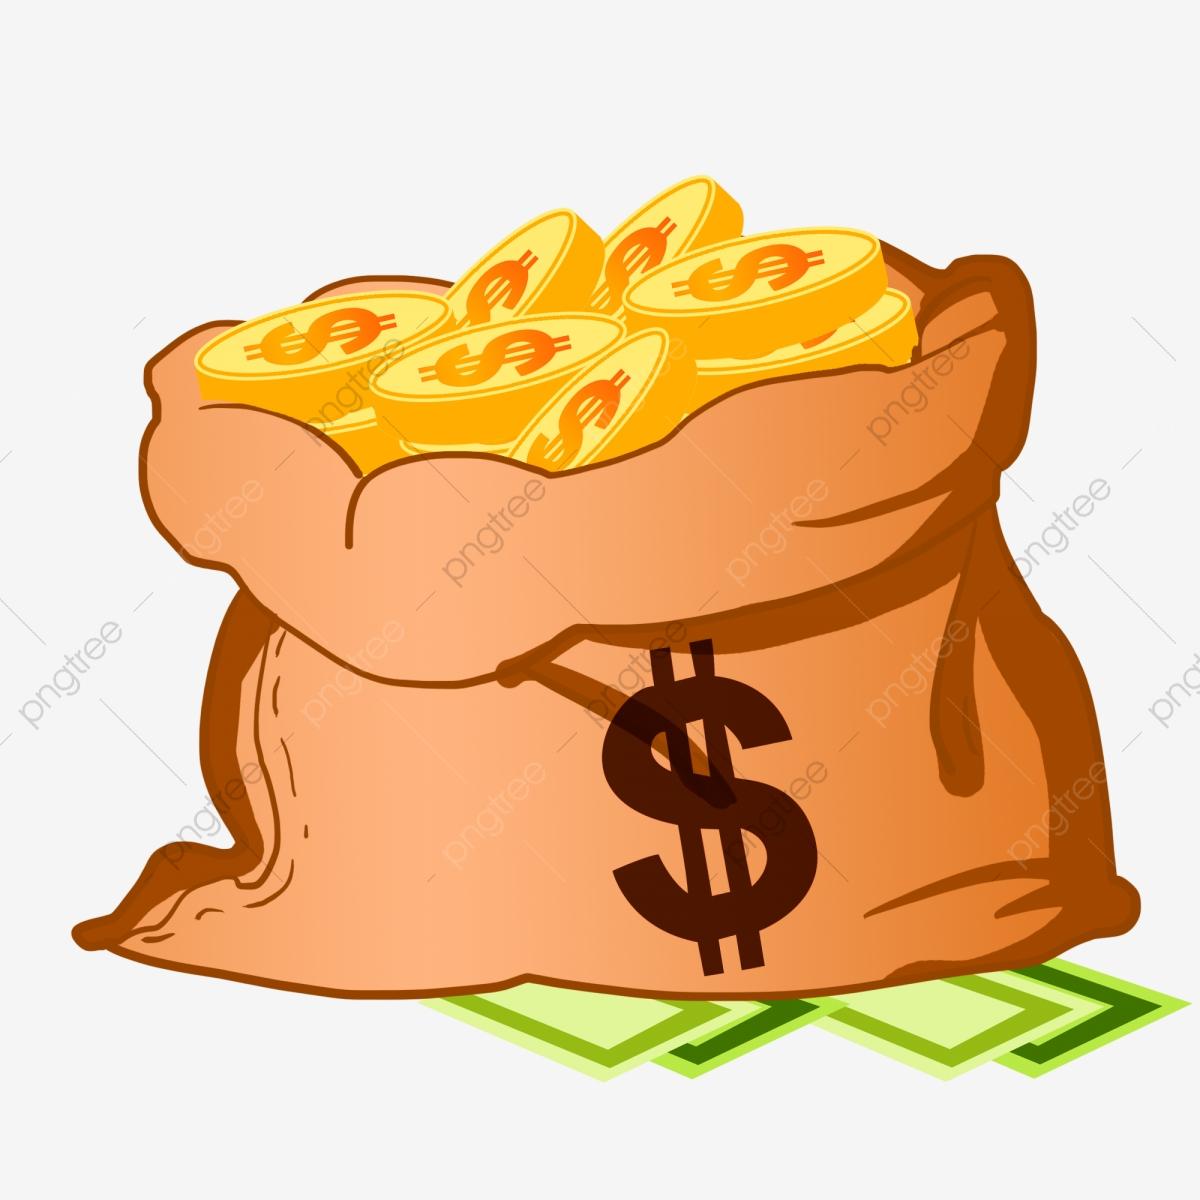 Cartoon Money Bag Money Bag A Bag Of Gold Coins Banknotes Under The.